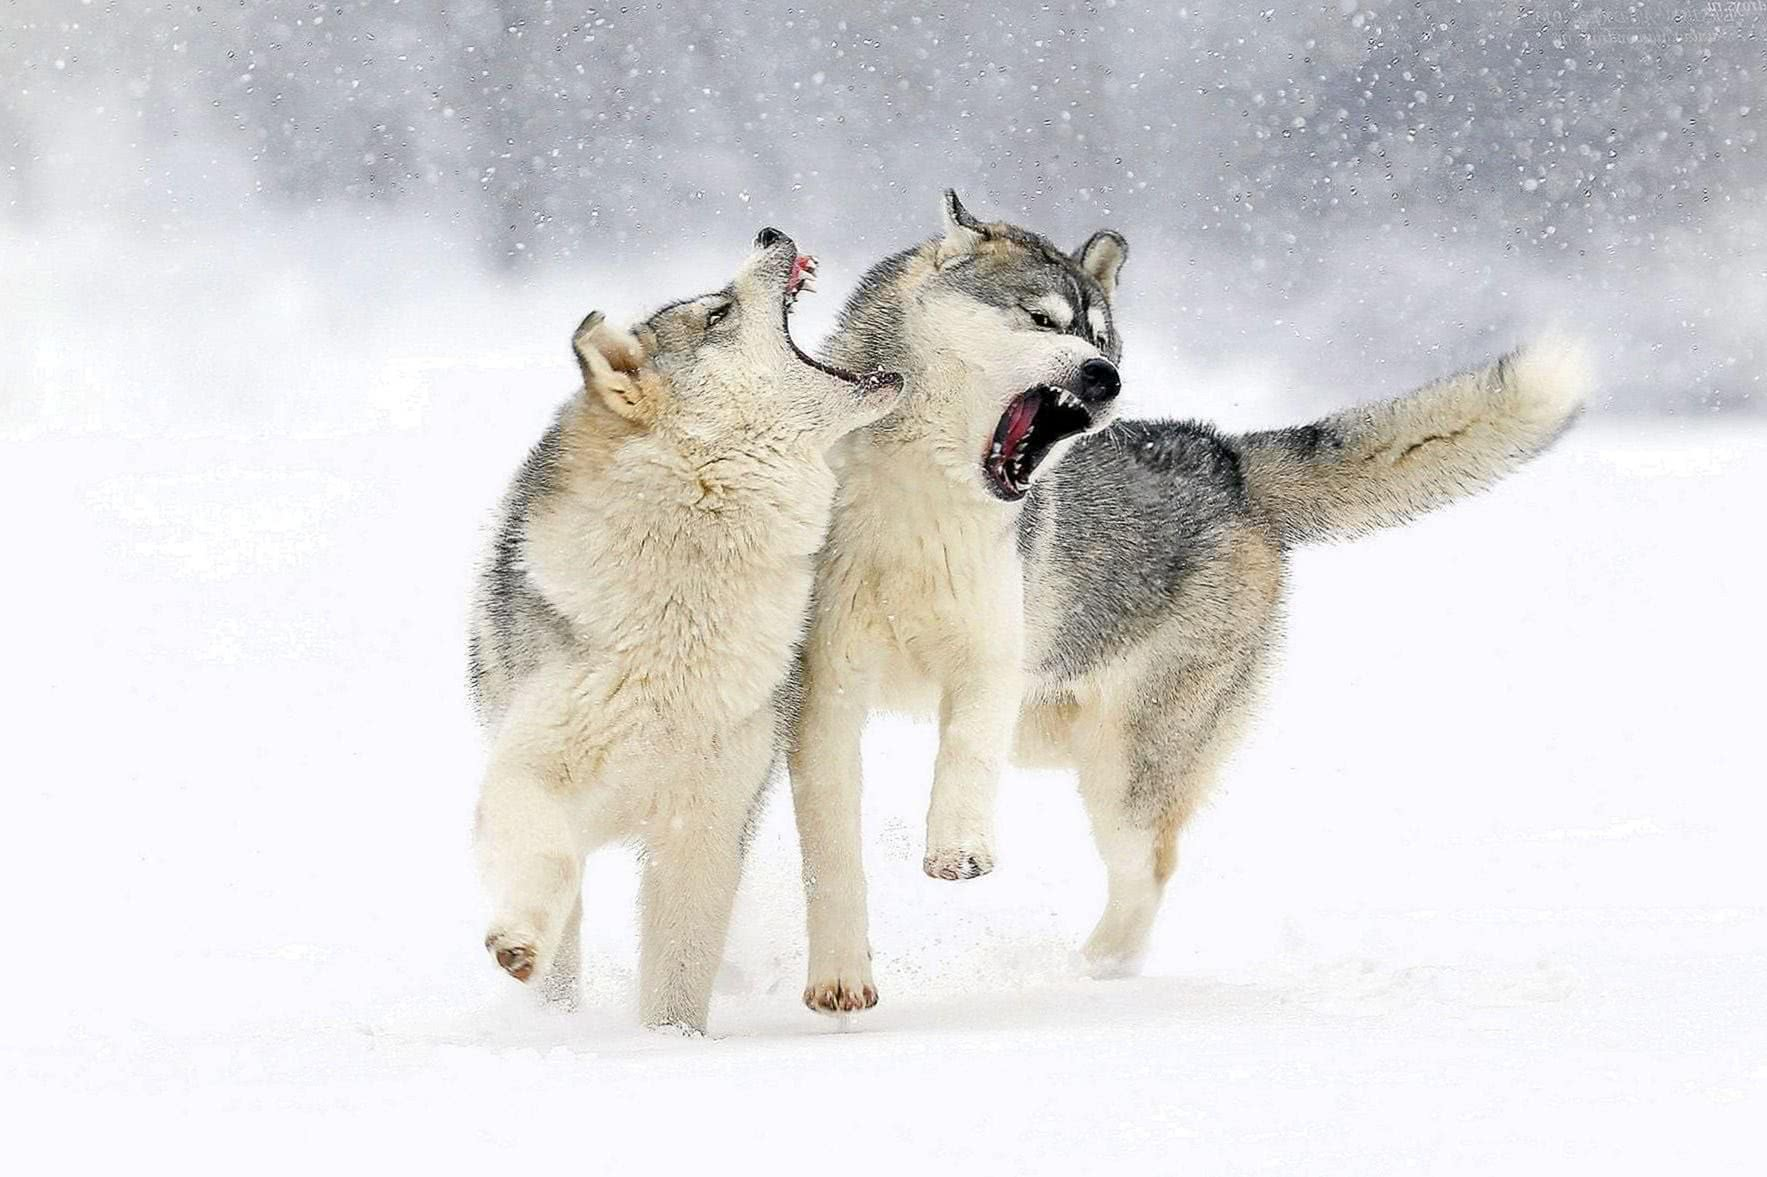 Wolf Snow Wallpaper HD